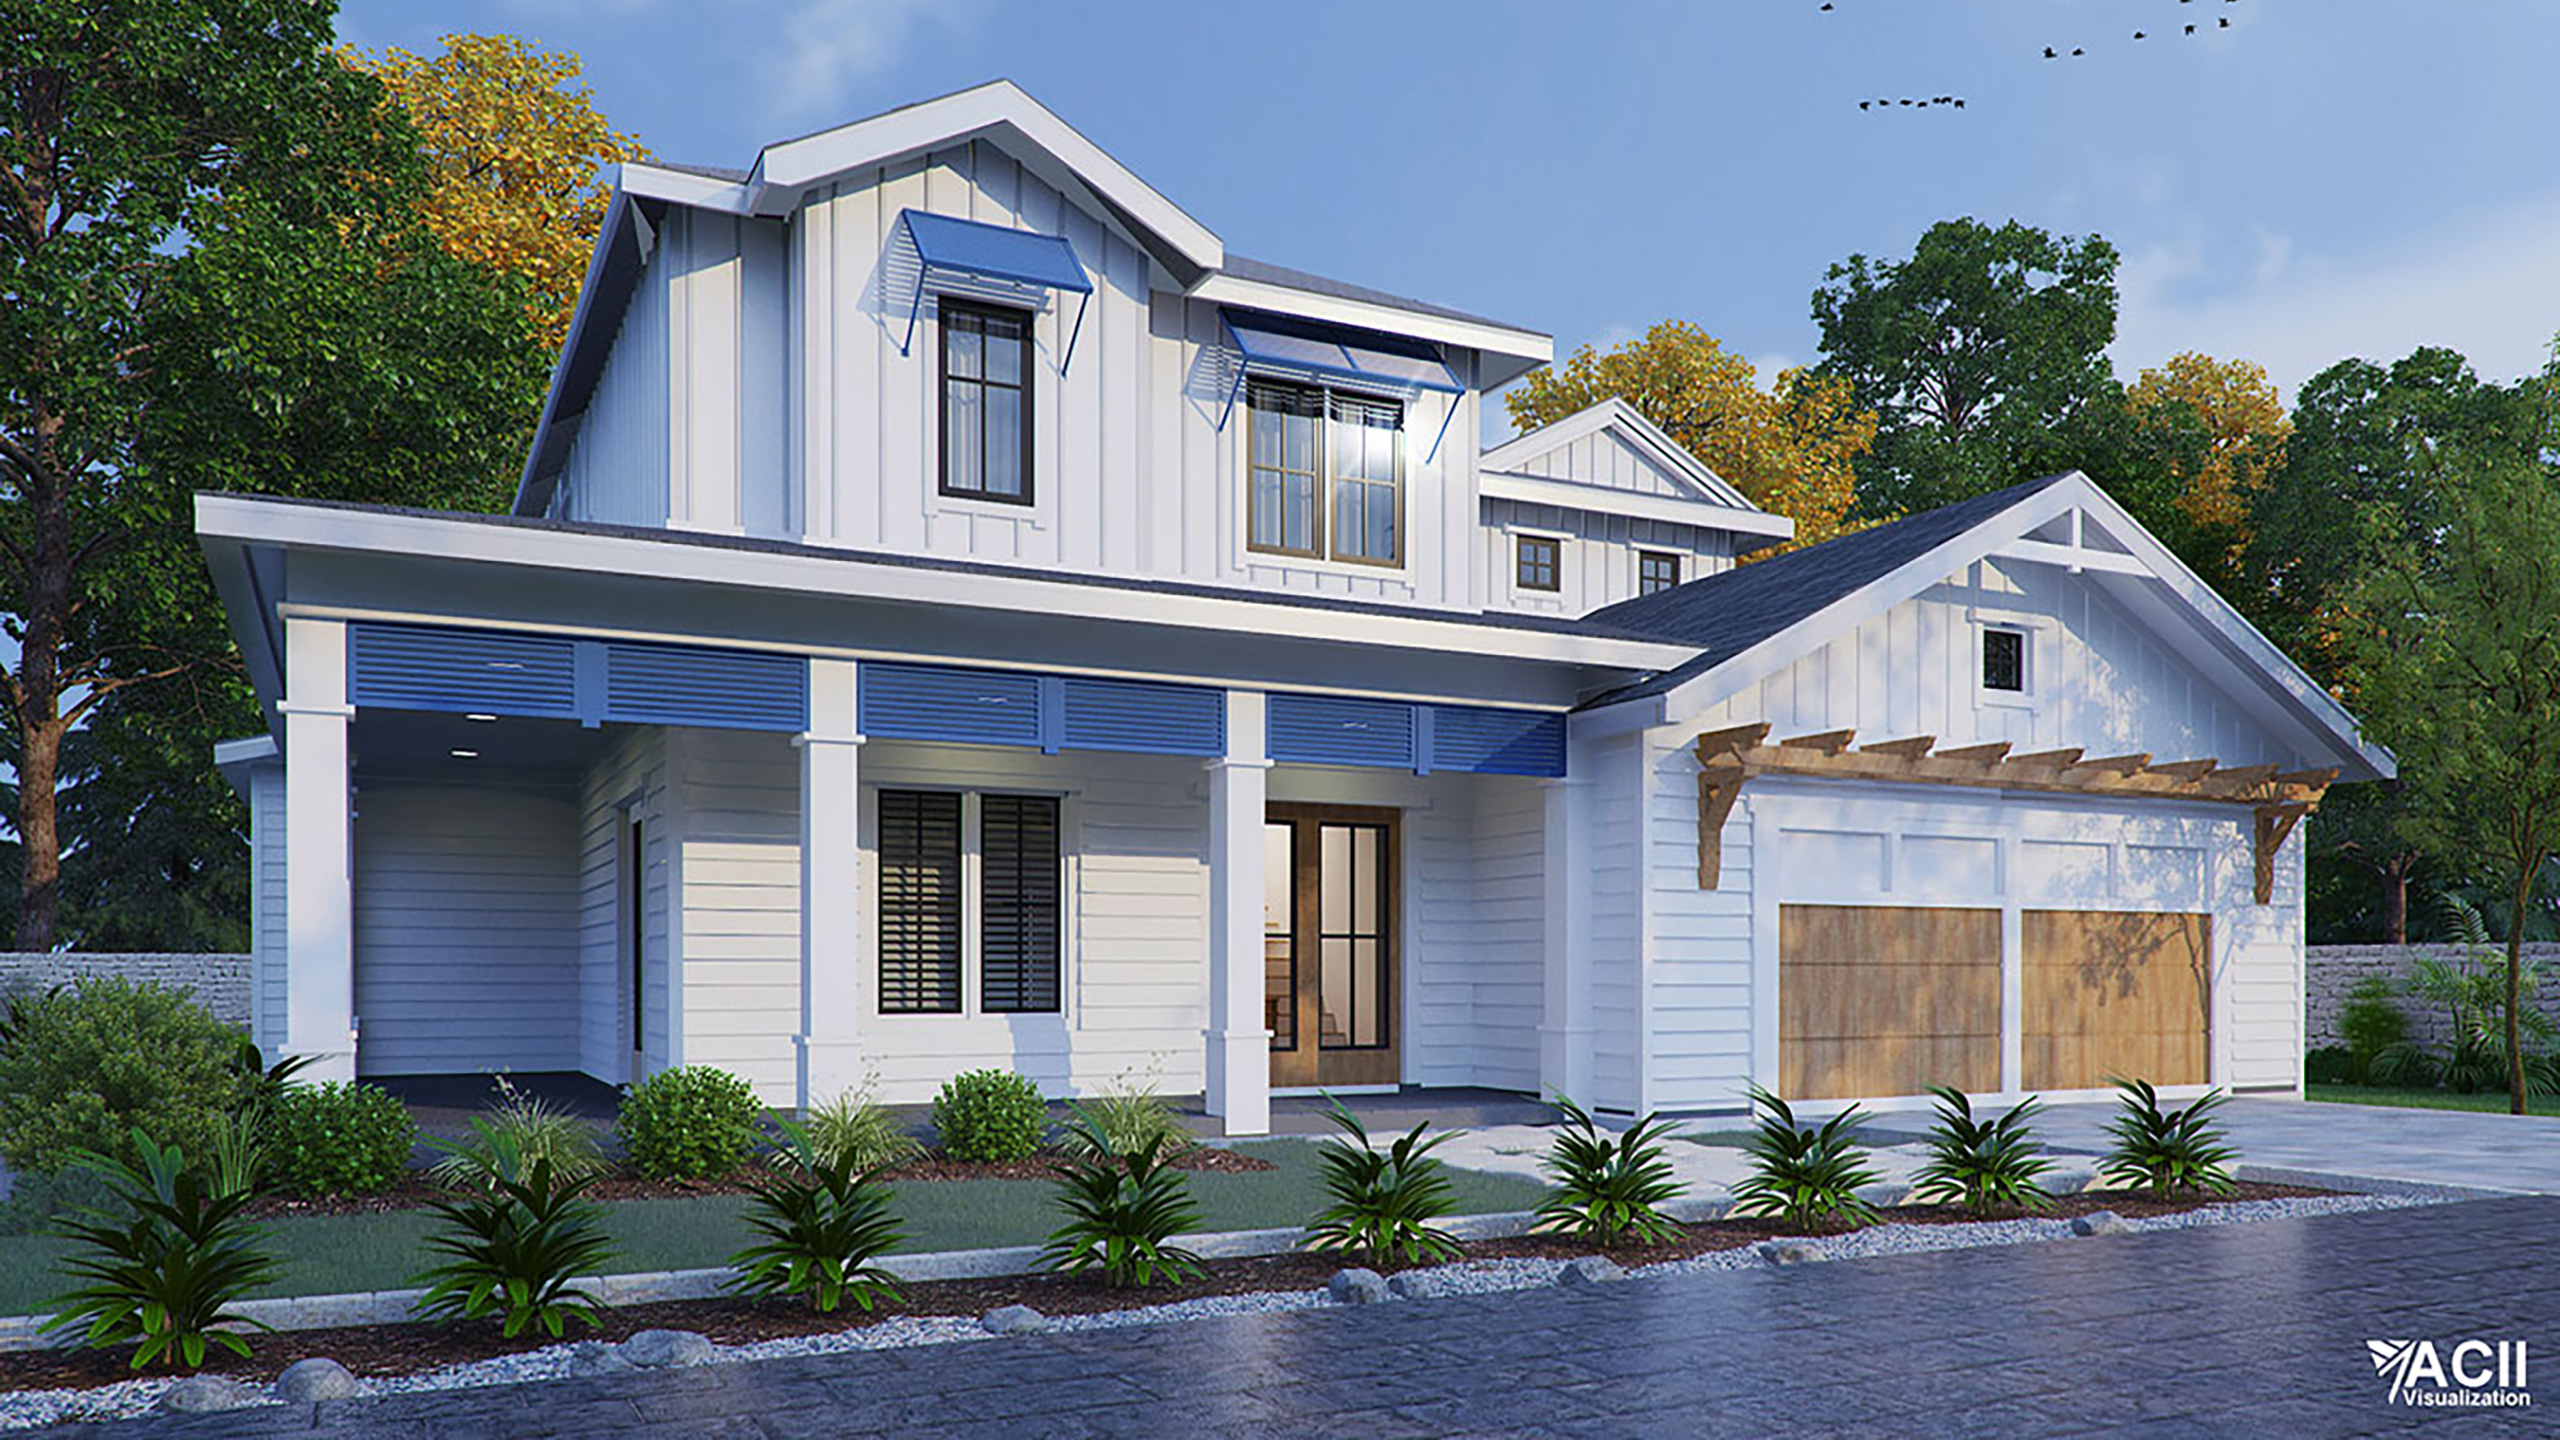 THE WHITE HOUSE MODEL Photo